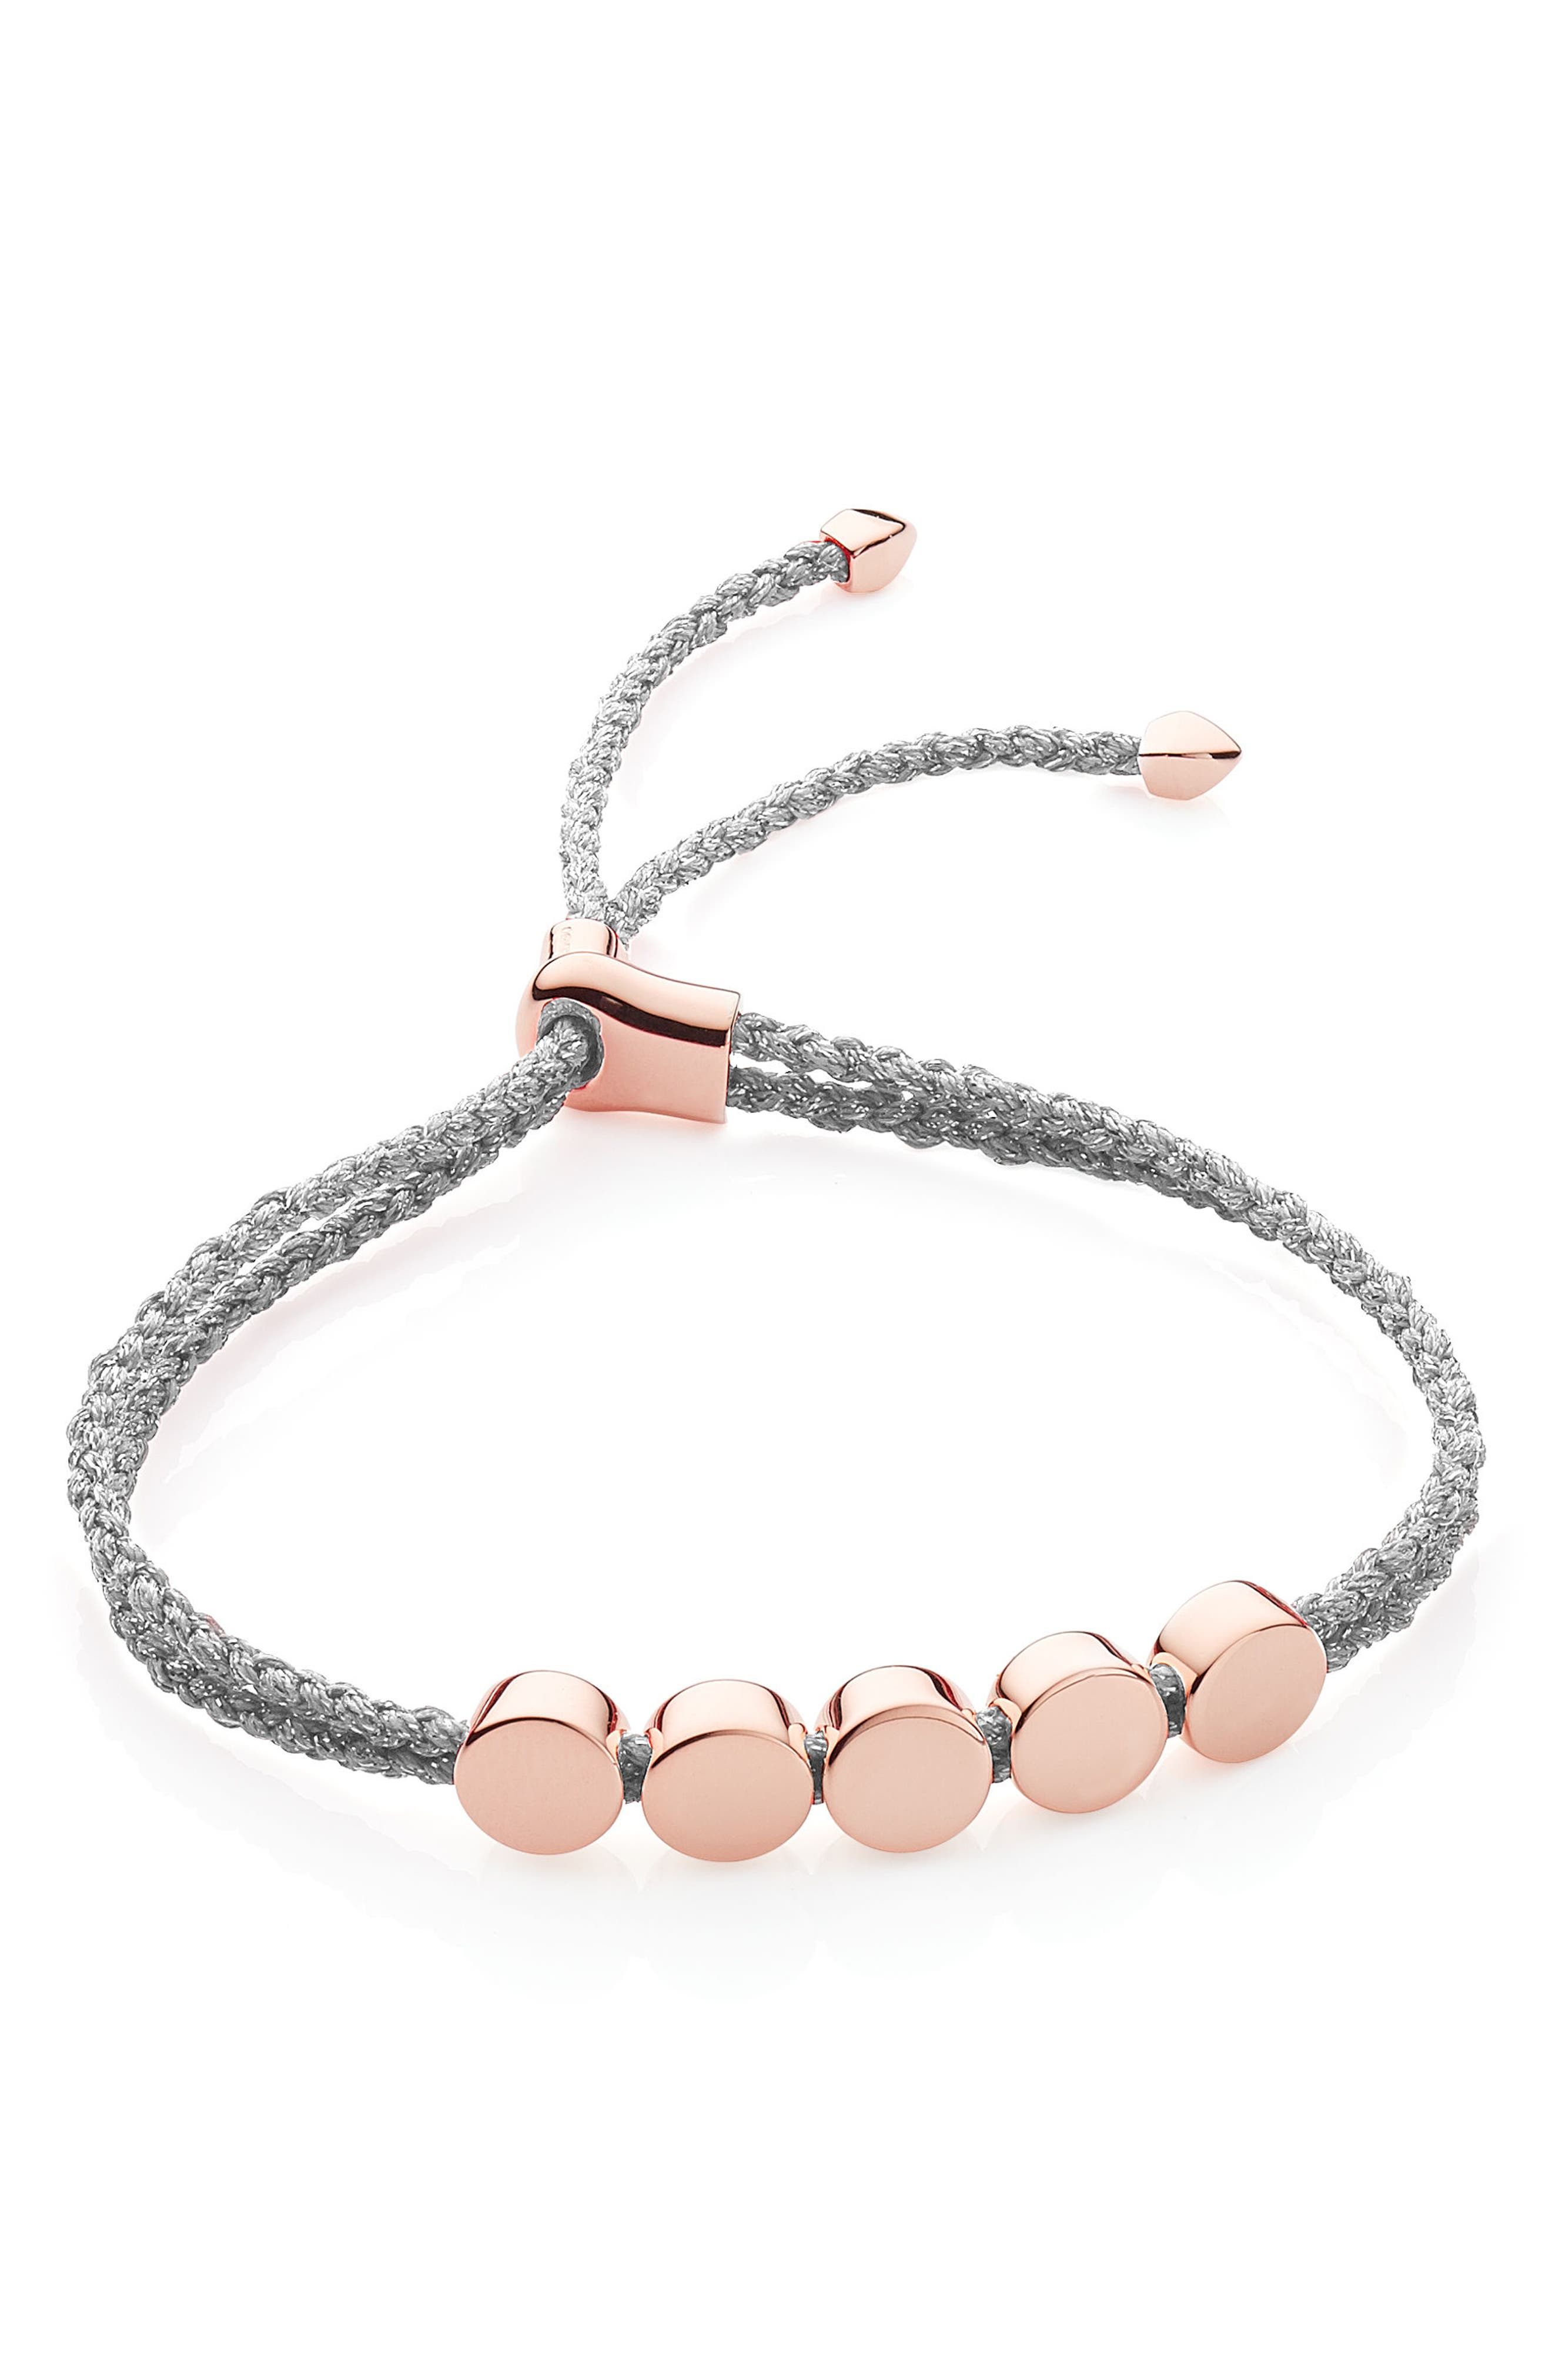 Engravable Linear Bead Friendship Bracelet,                         Main,                         color, ROSE GOLD/ SILVER METALLIC